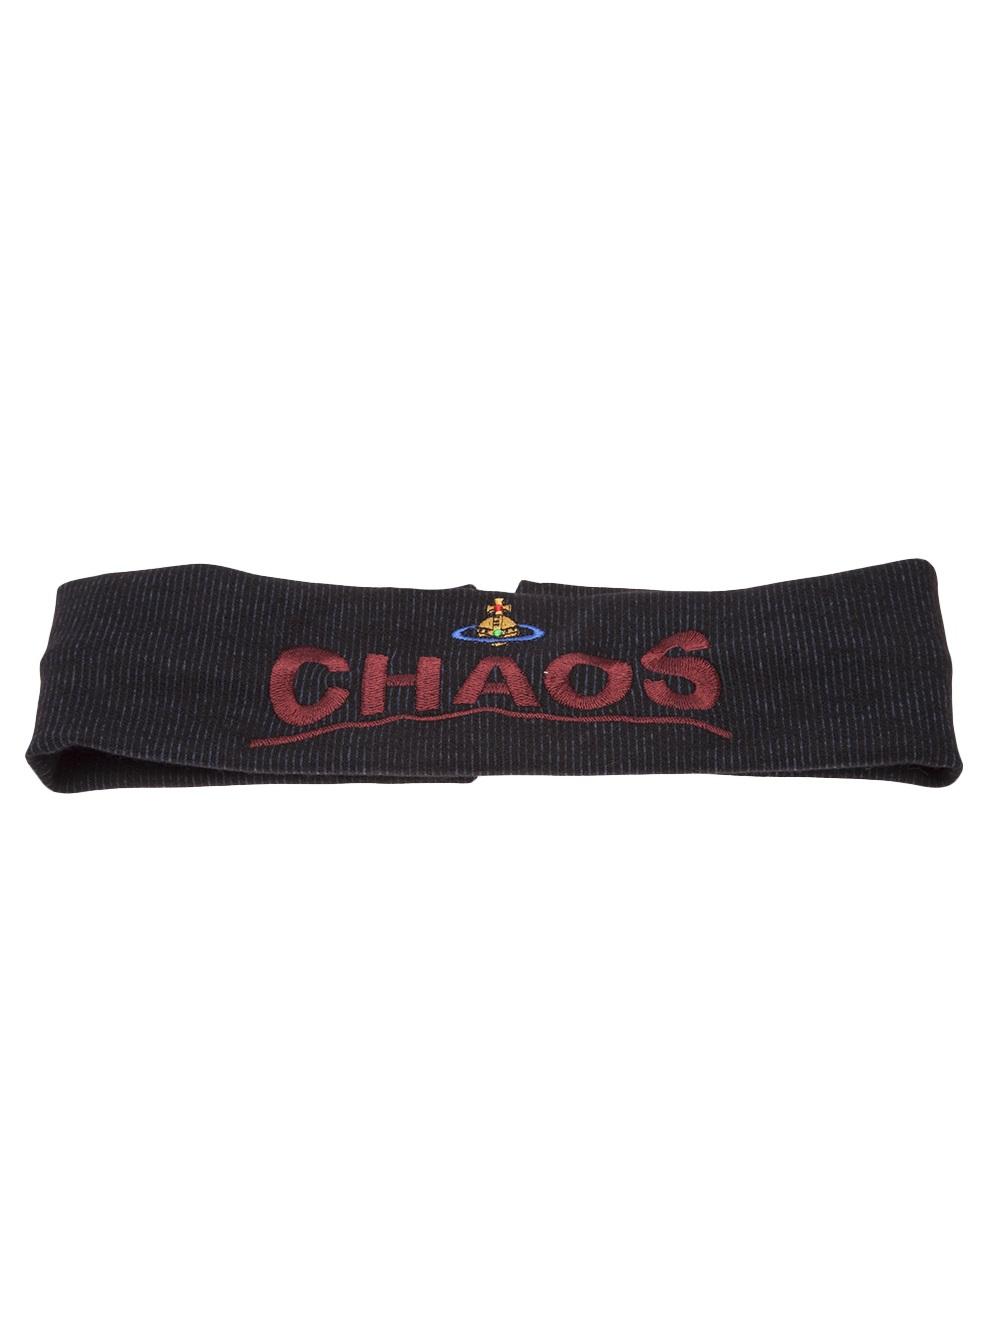 Lyst Vivienne Westwood Chaos Headband In Black